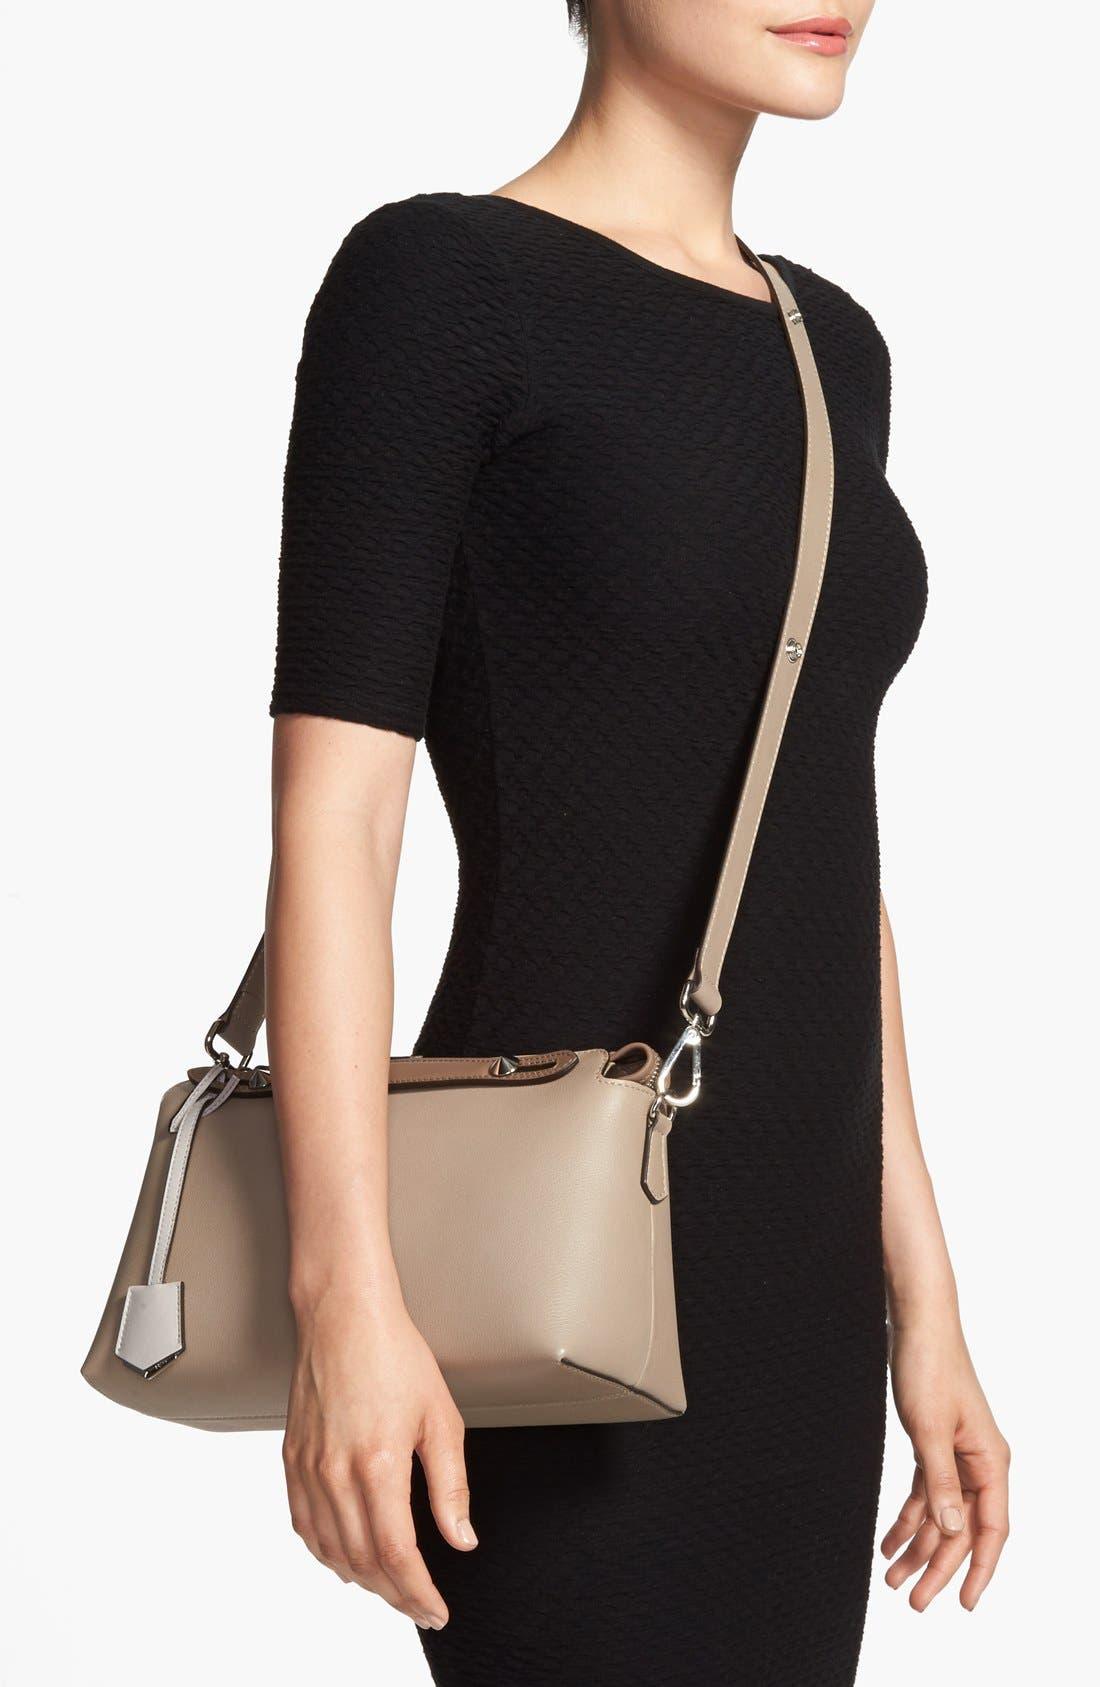 'Bauletto Piccolo' Leather Crossbody Bag,                             Alternate thumbnail 2, color,                             Turtledv Sepia Palladuim